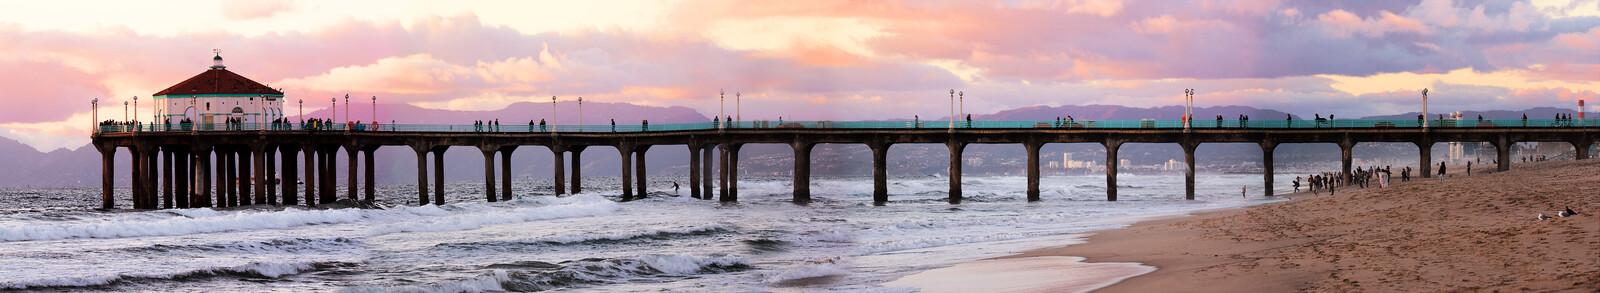 Manhattan Beach Pier - Larry Yust